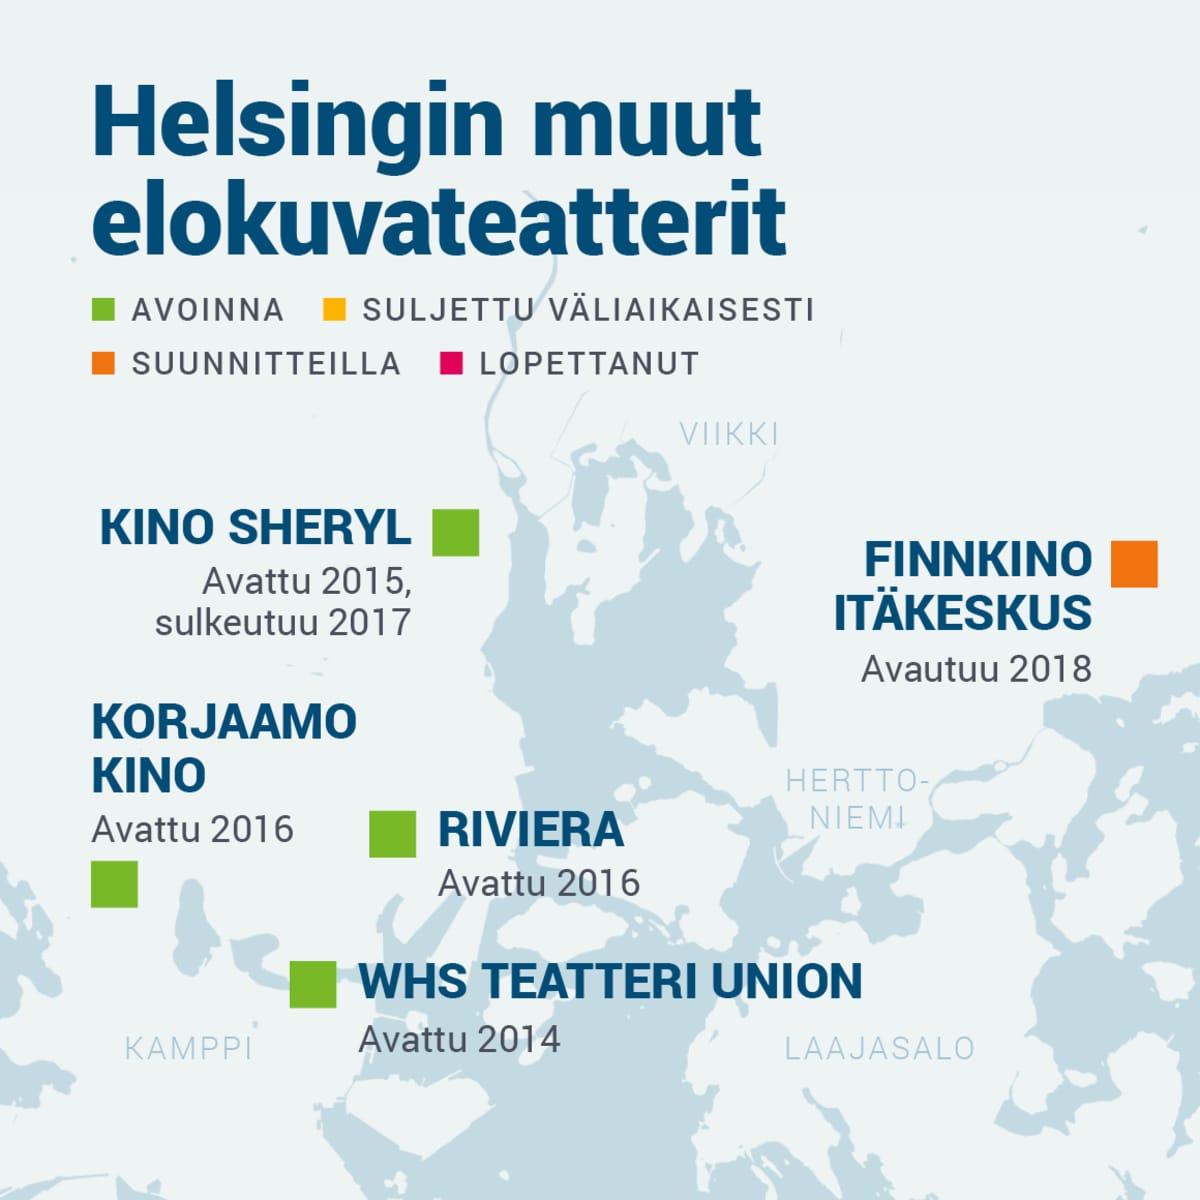 Helsingin muut elokuvateatterit.